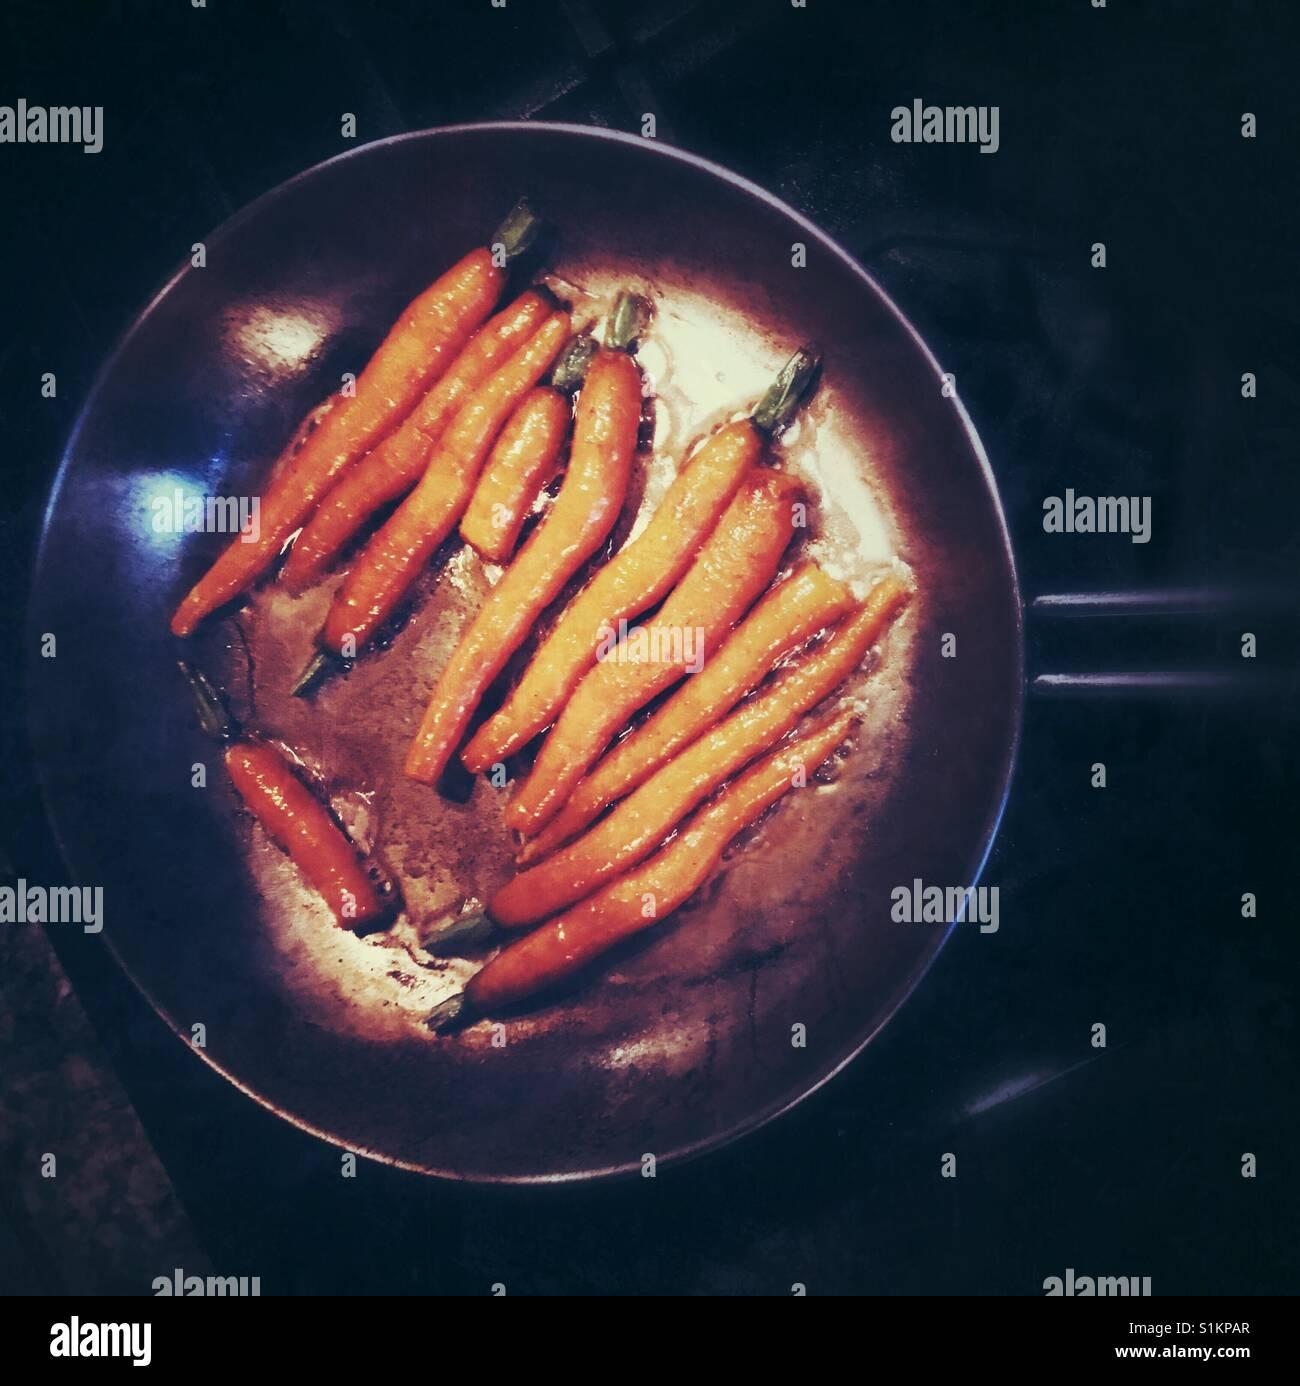 Seasonal fresh carrots simmering in butter in a pan. - Stock Image